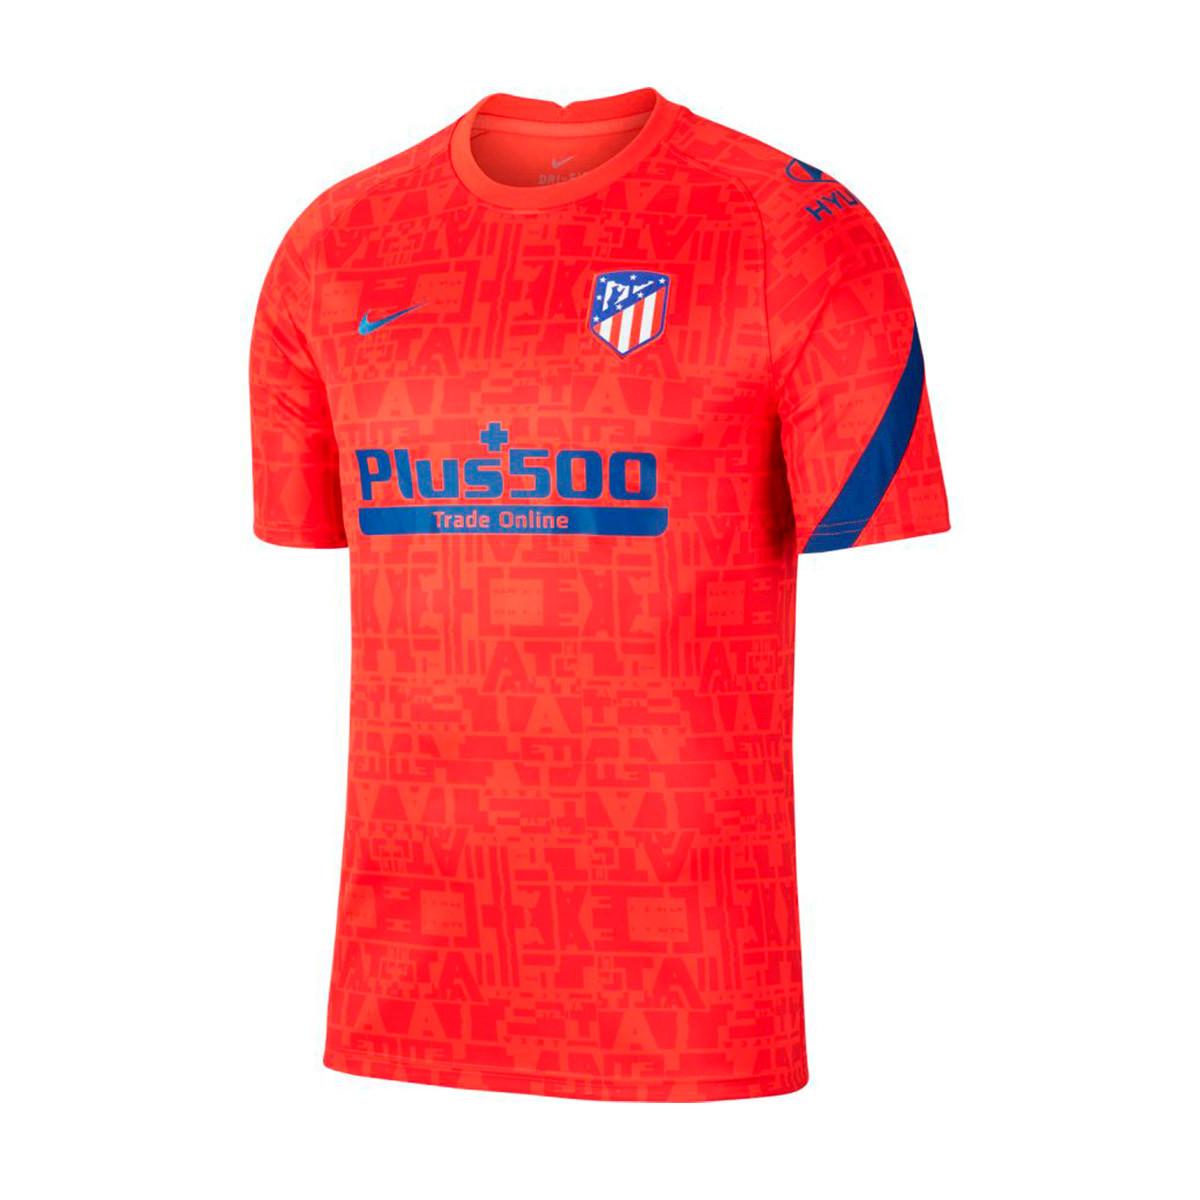 التحرير إعلان حيوية Nike Camiseta Atletico De Madrid Consultoriaorigenydestino Com